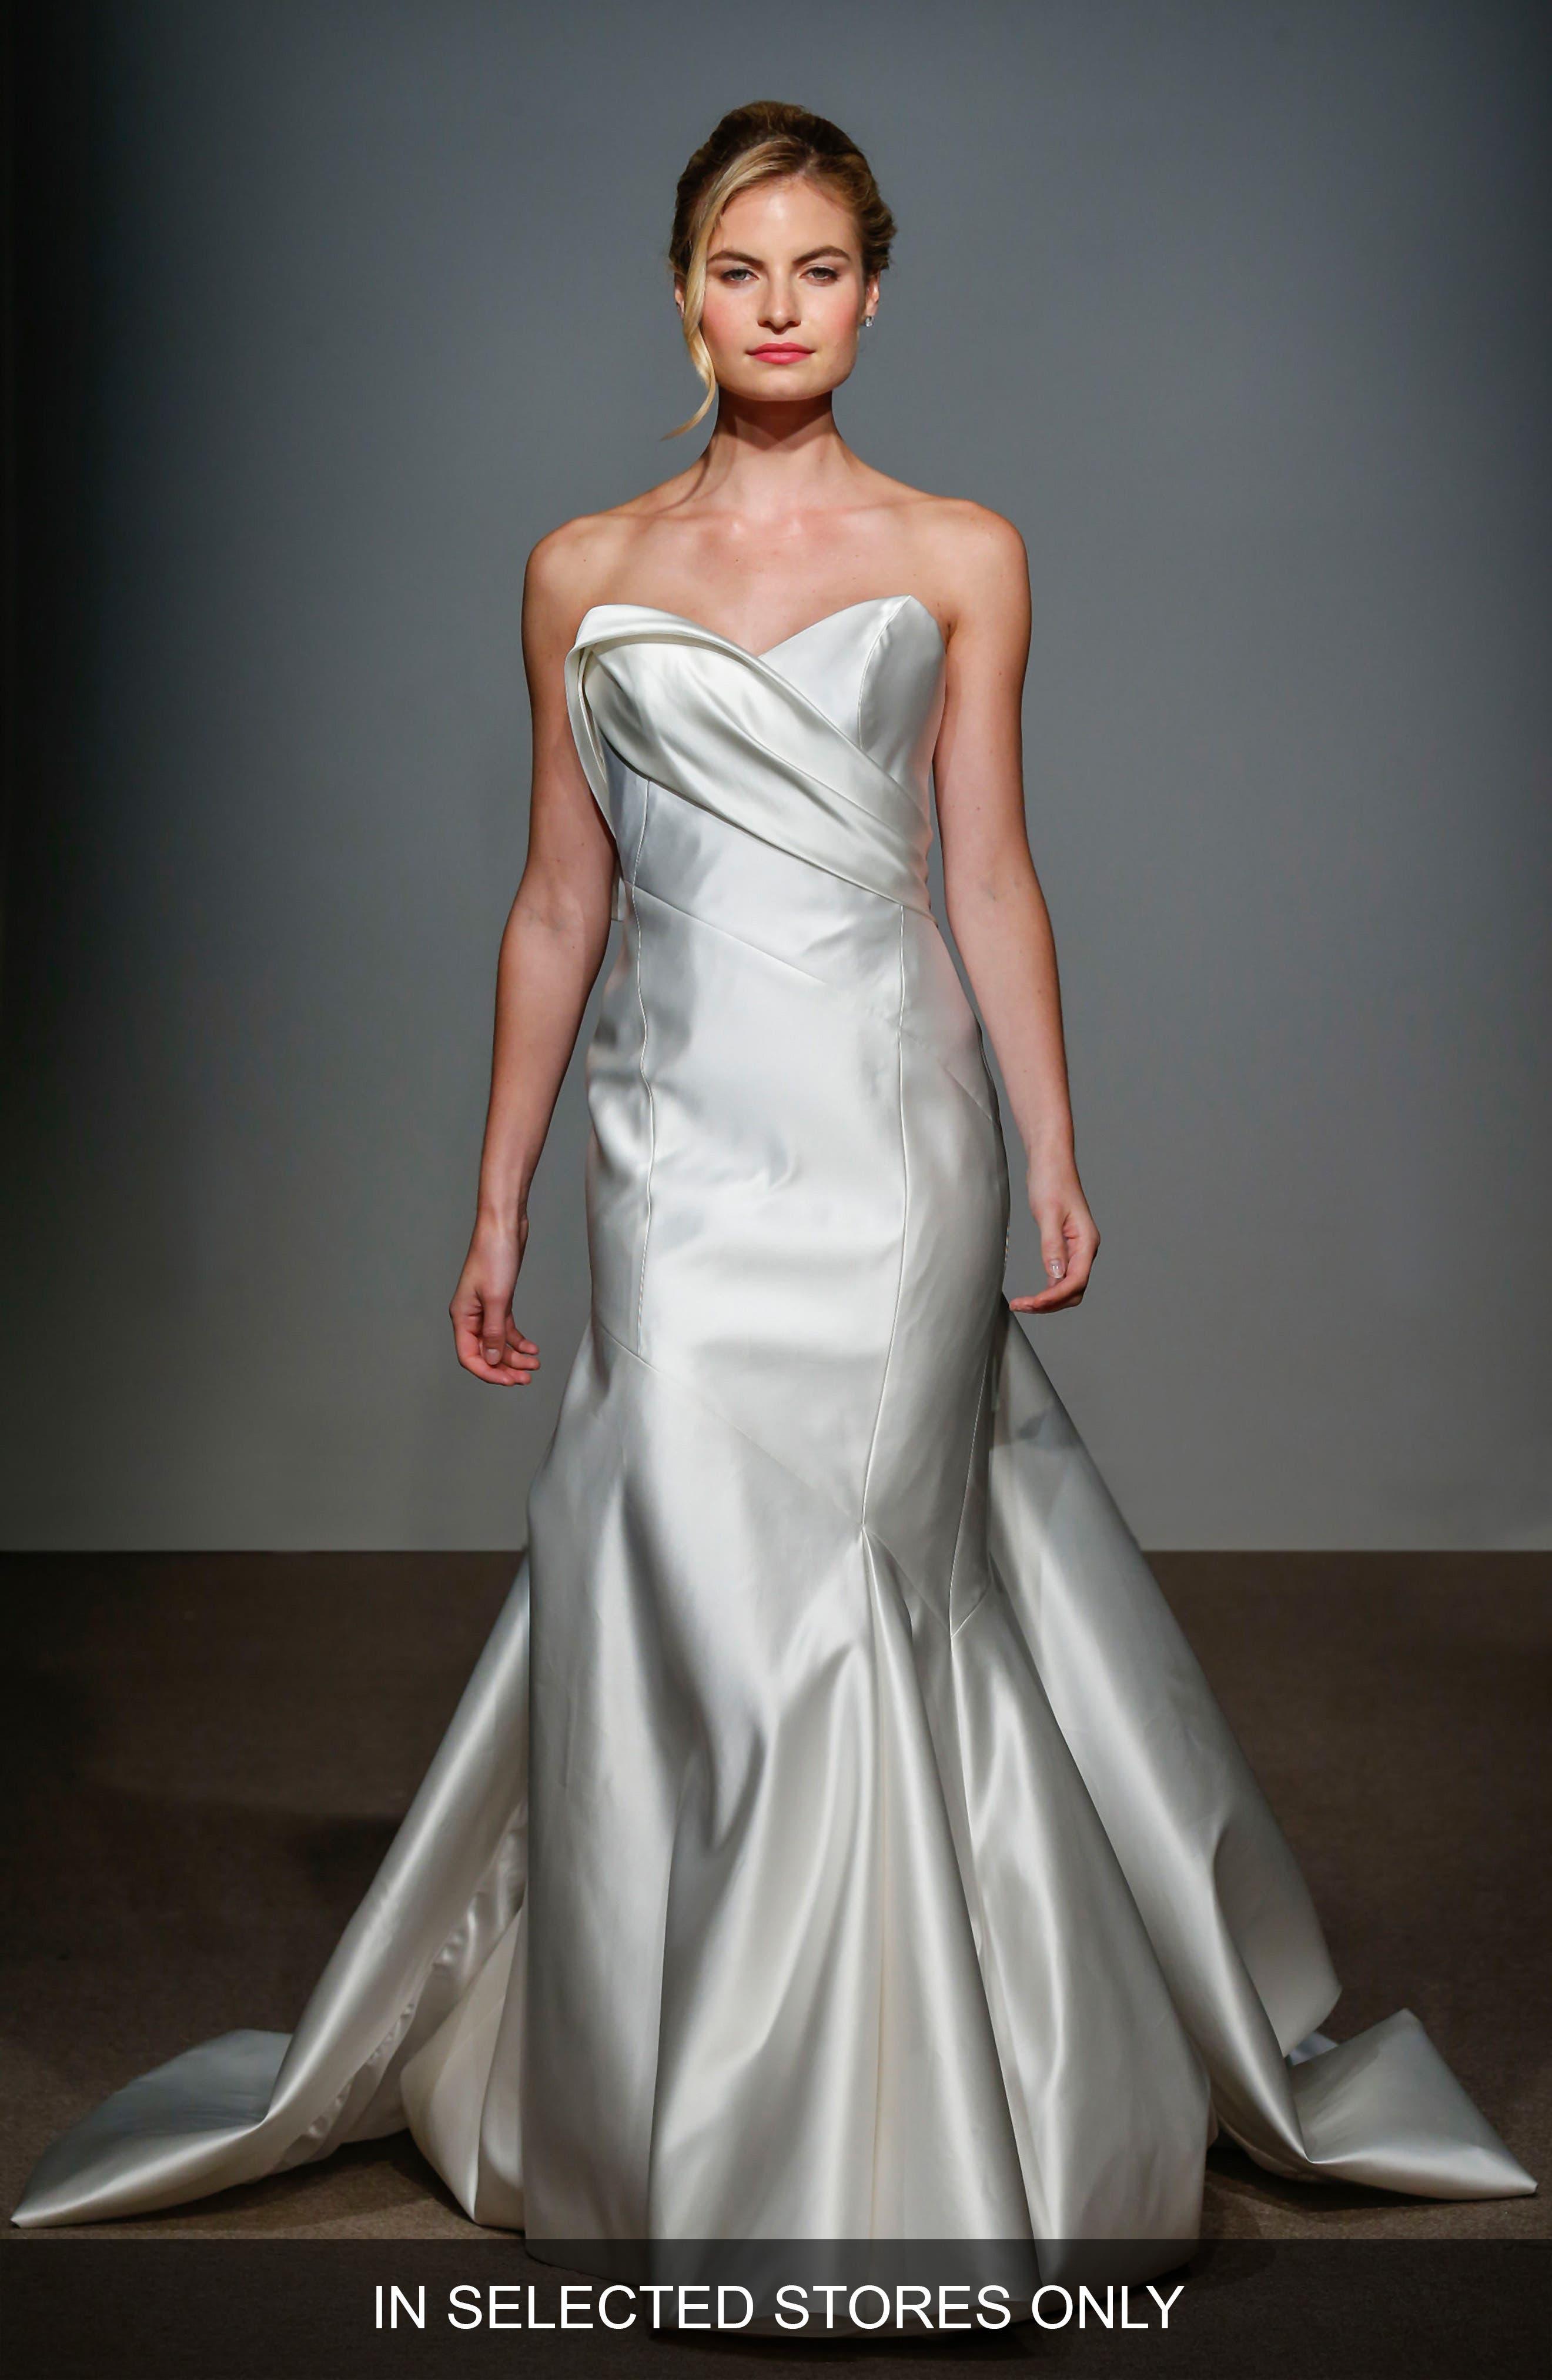 Daryl Asymmetrical Seam Satin Mermaid Gown,                         Main,                         color, 115